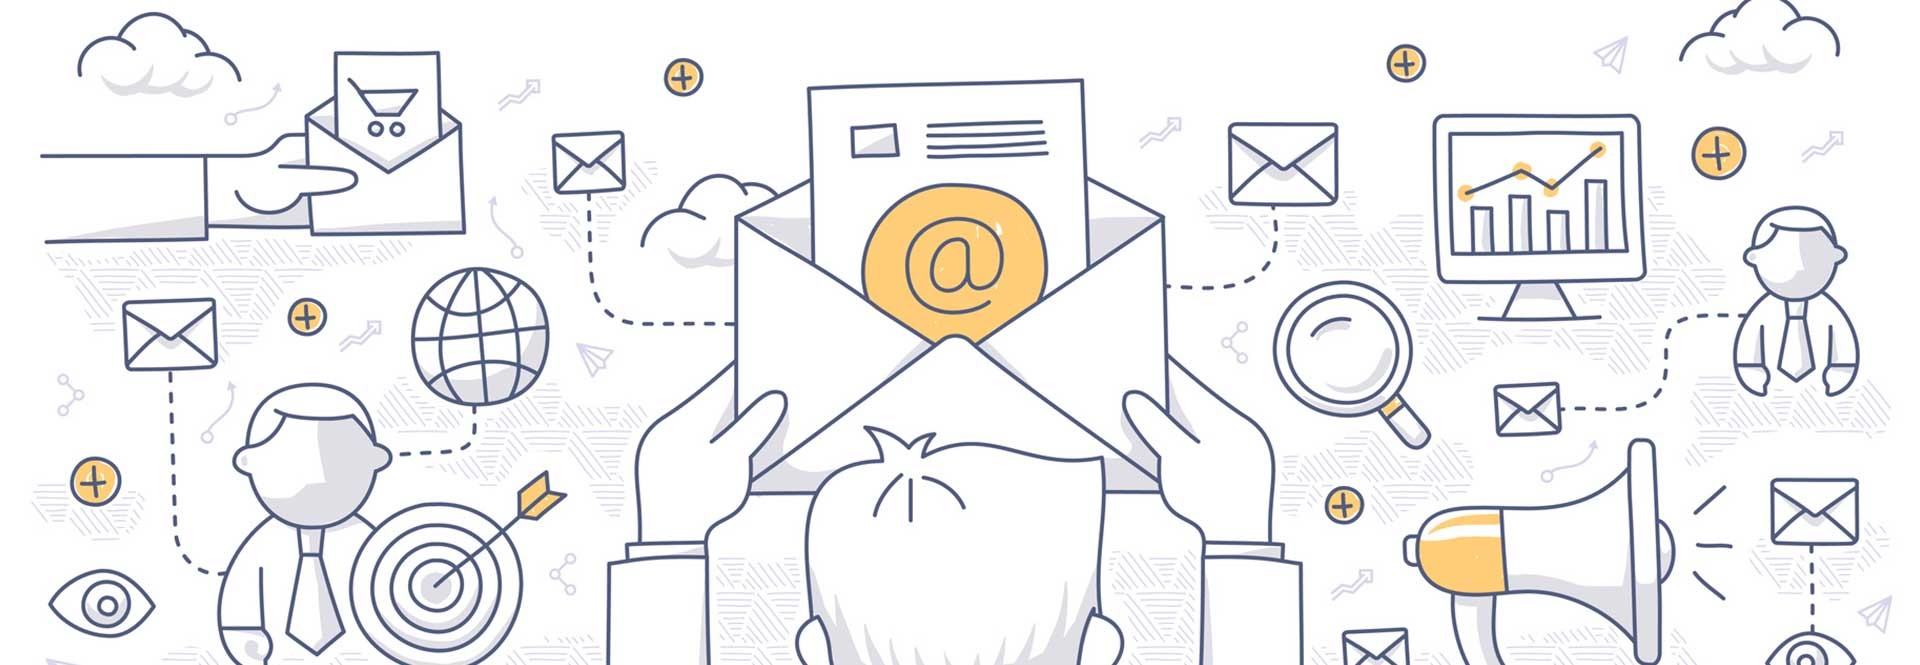 Agenzia-Email-Marketing-Newsletter-Milano